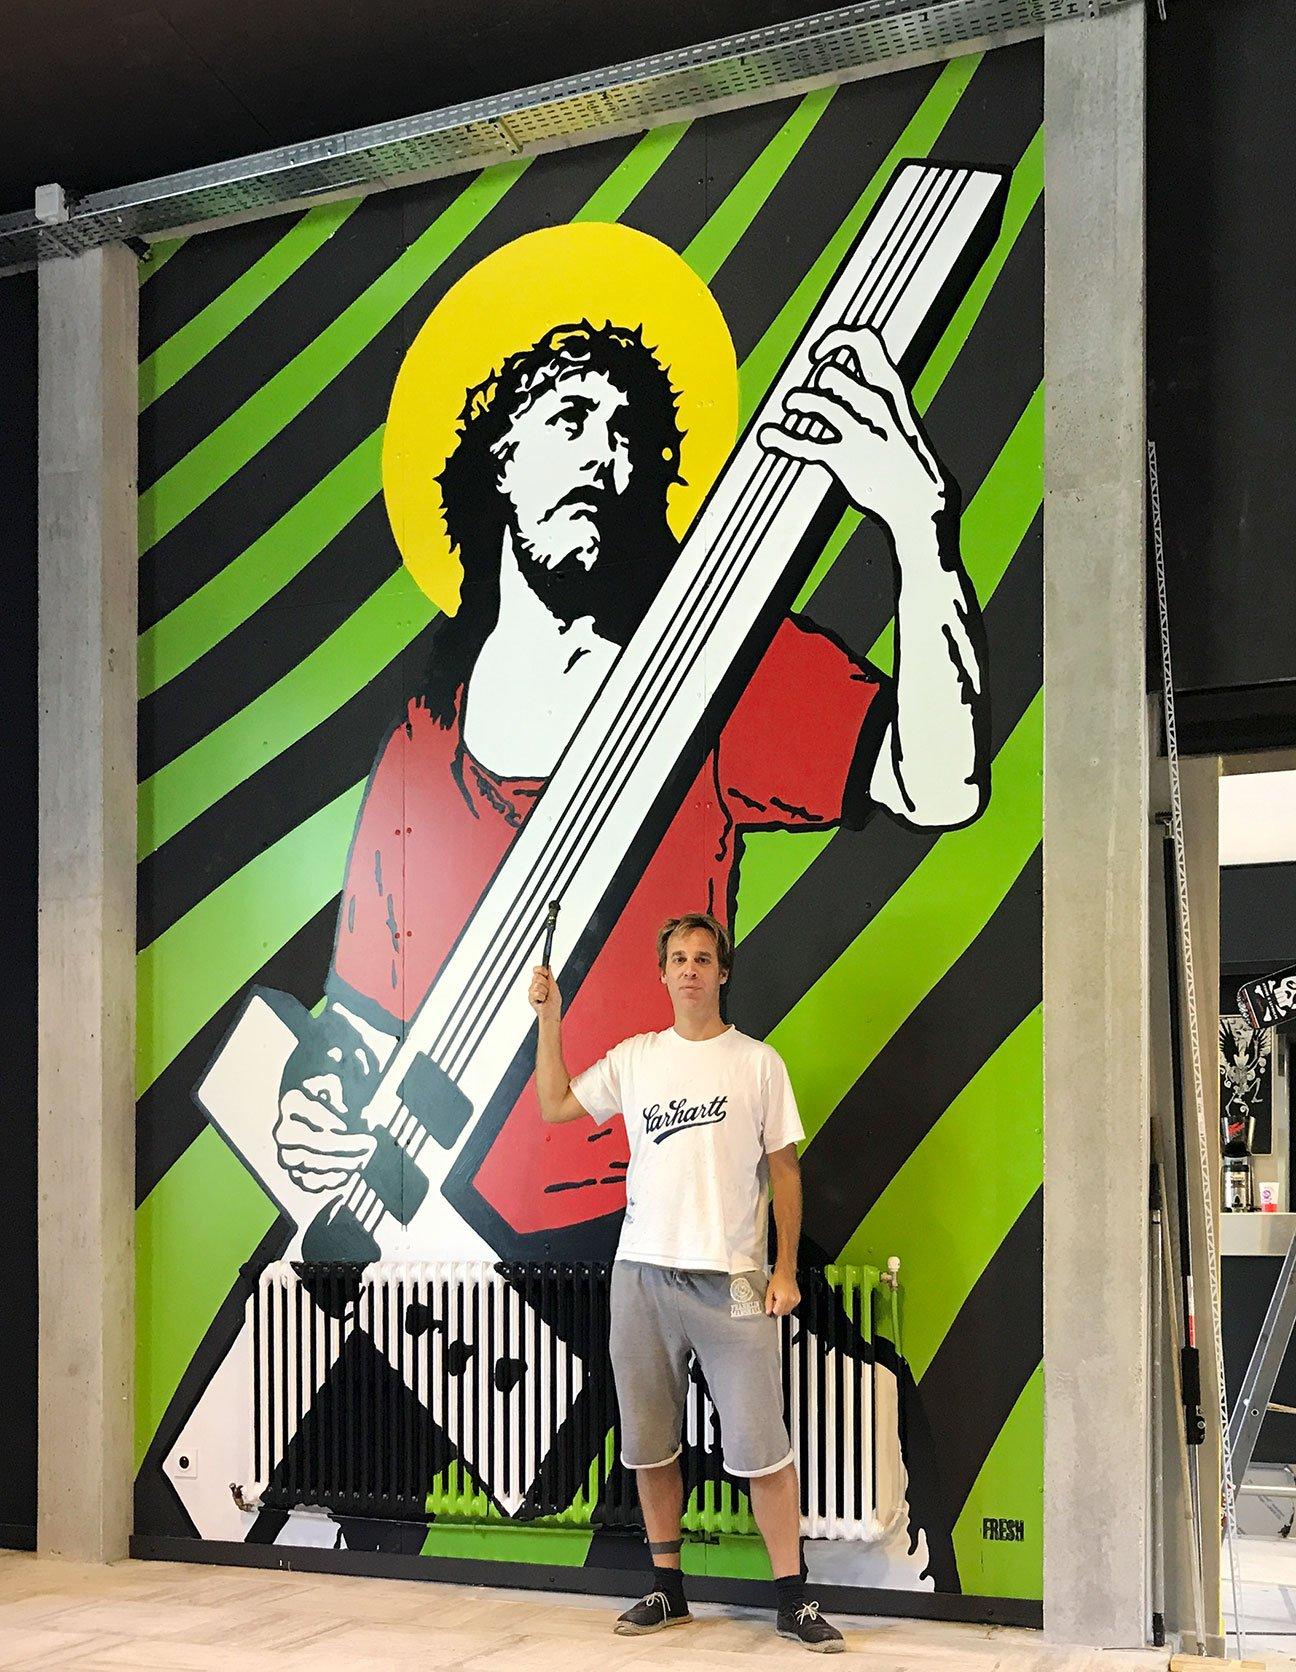 Fabien_cuffel_LePoulpe_Resto_Bar_Concert_Wall_Painting_Jesus